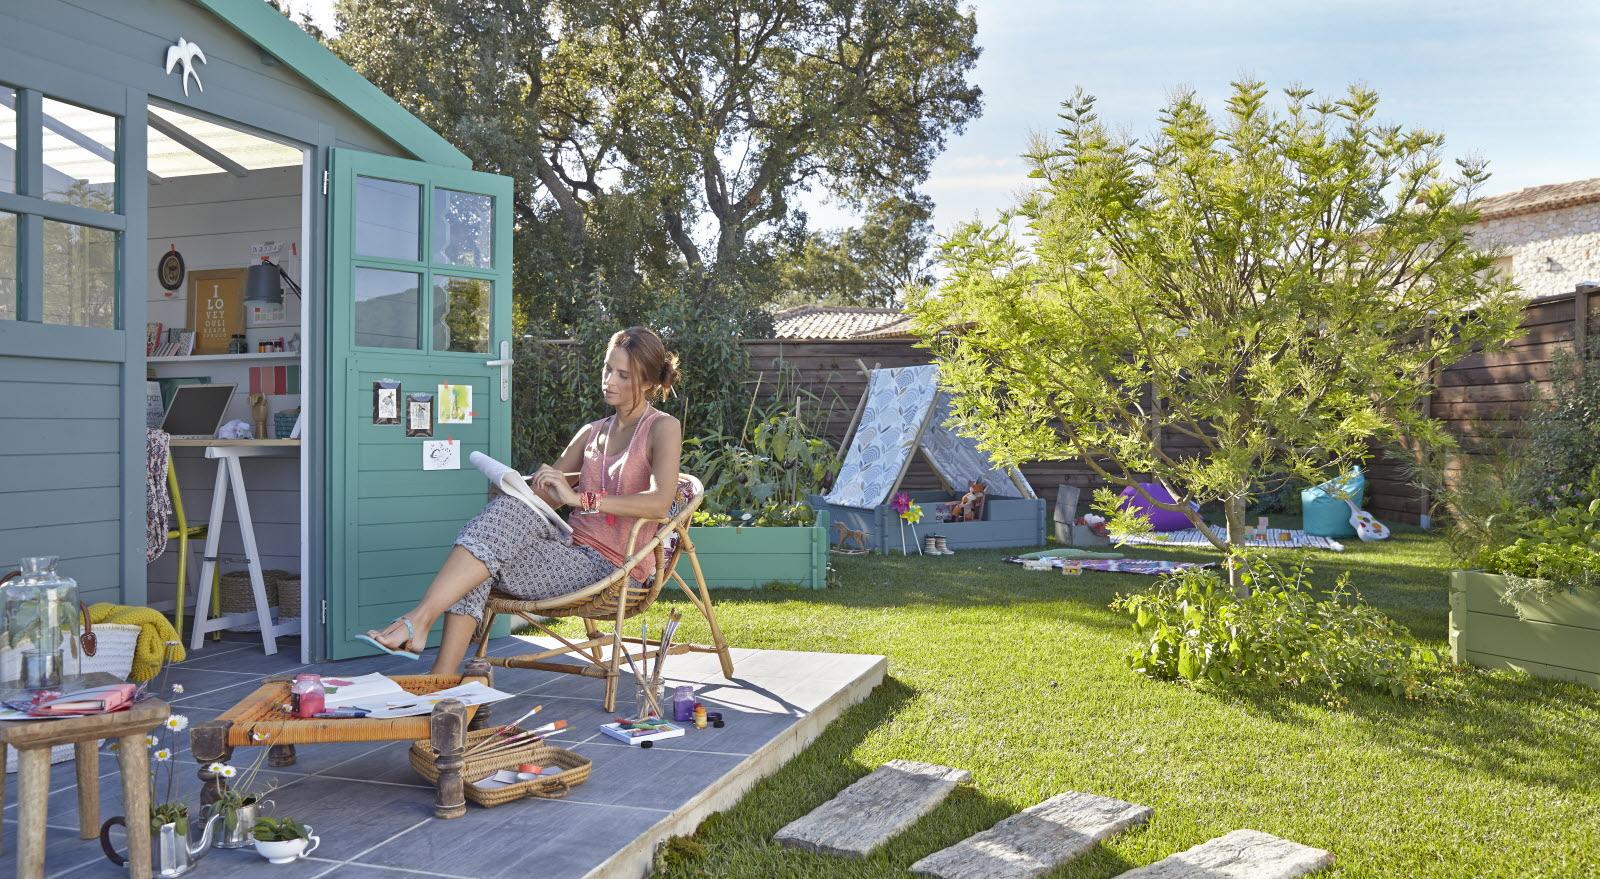 Magazine Lifestyle | Transformez Votre Cabane De Jardin En ... concernant Cabane De Jardin Leroy Merlin